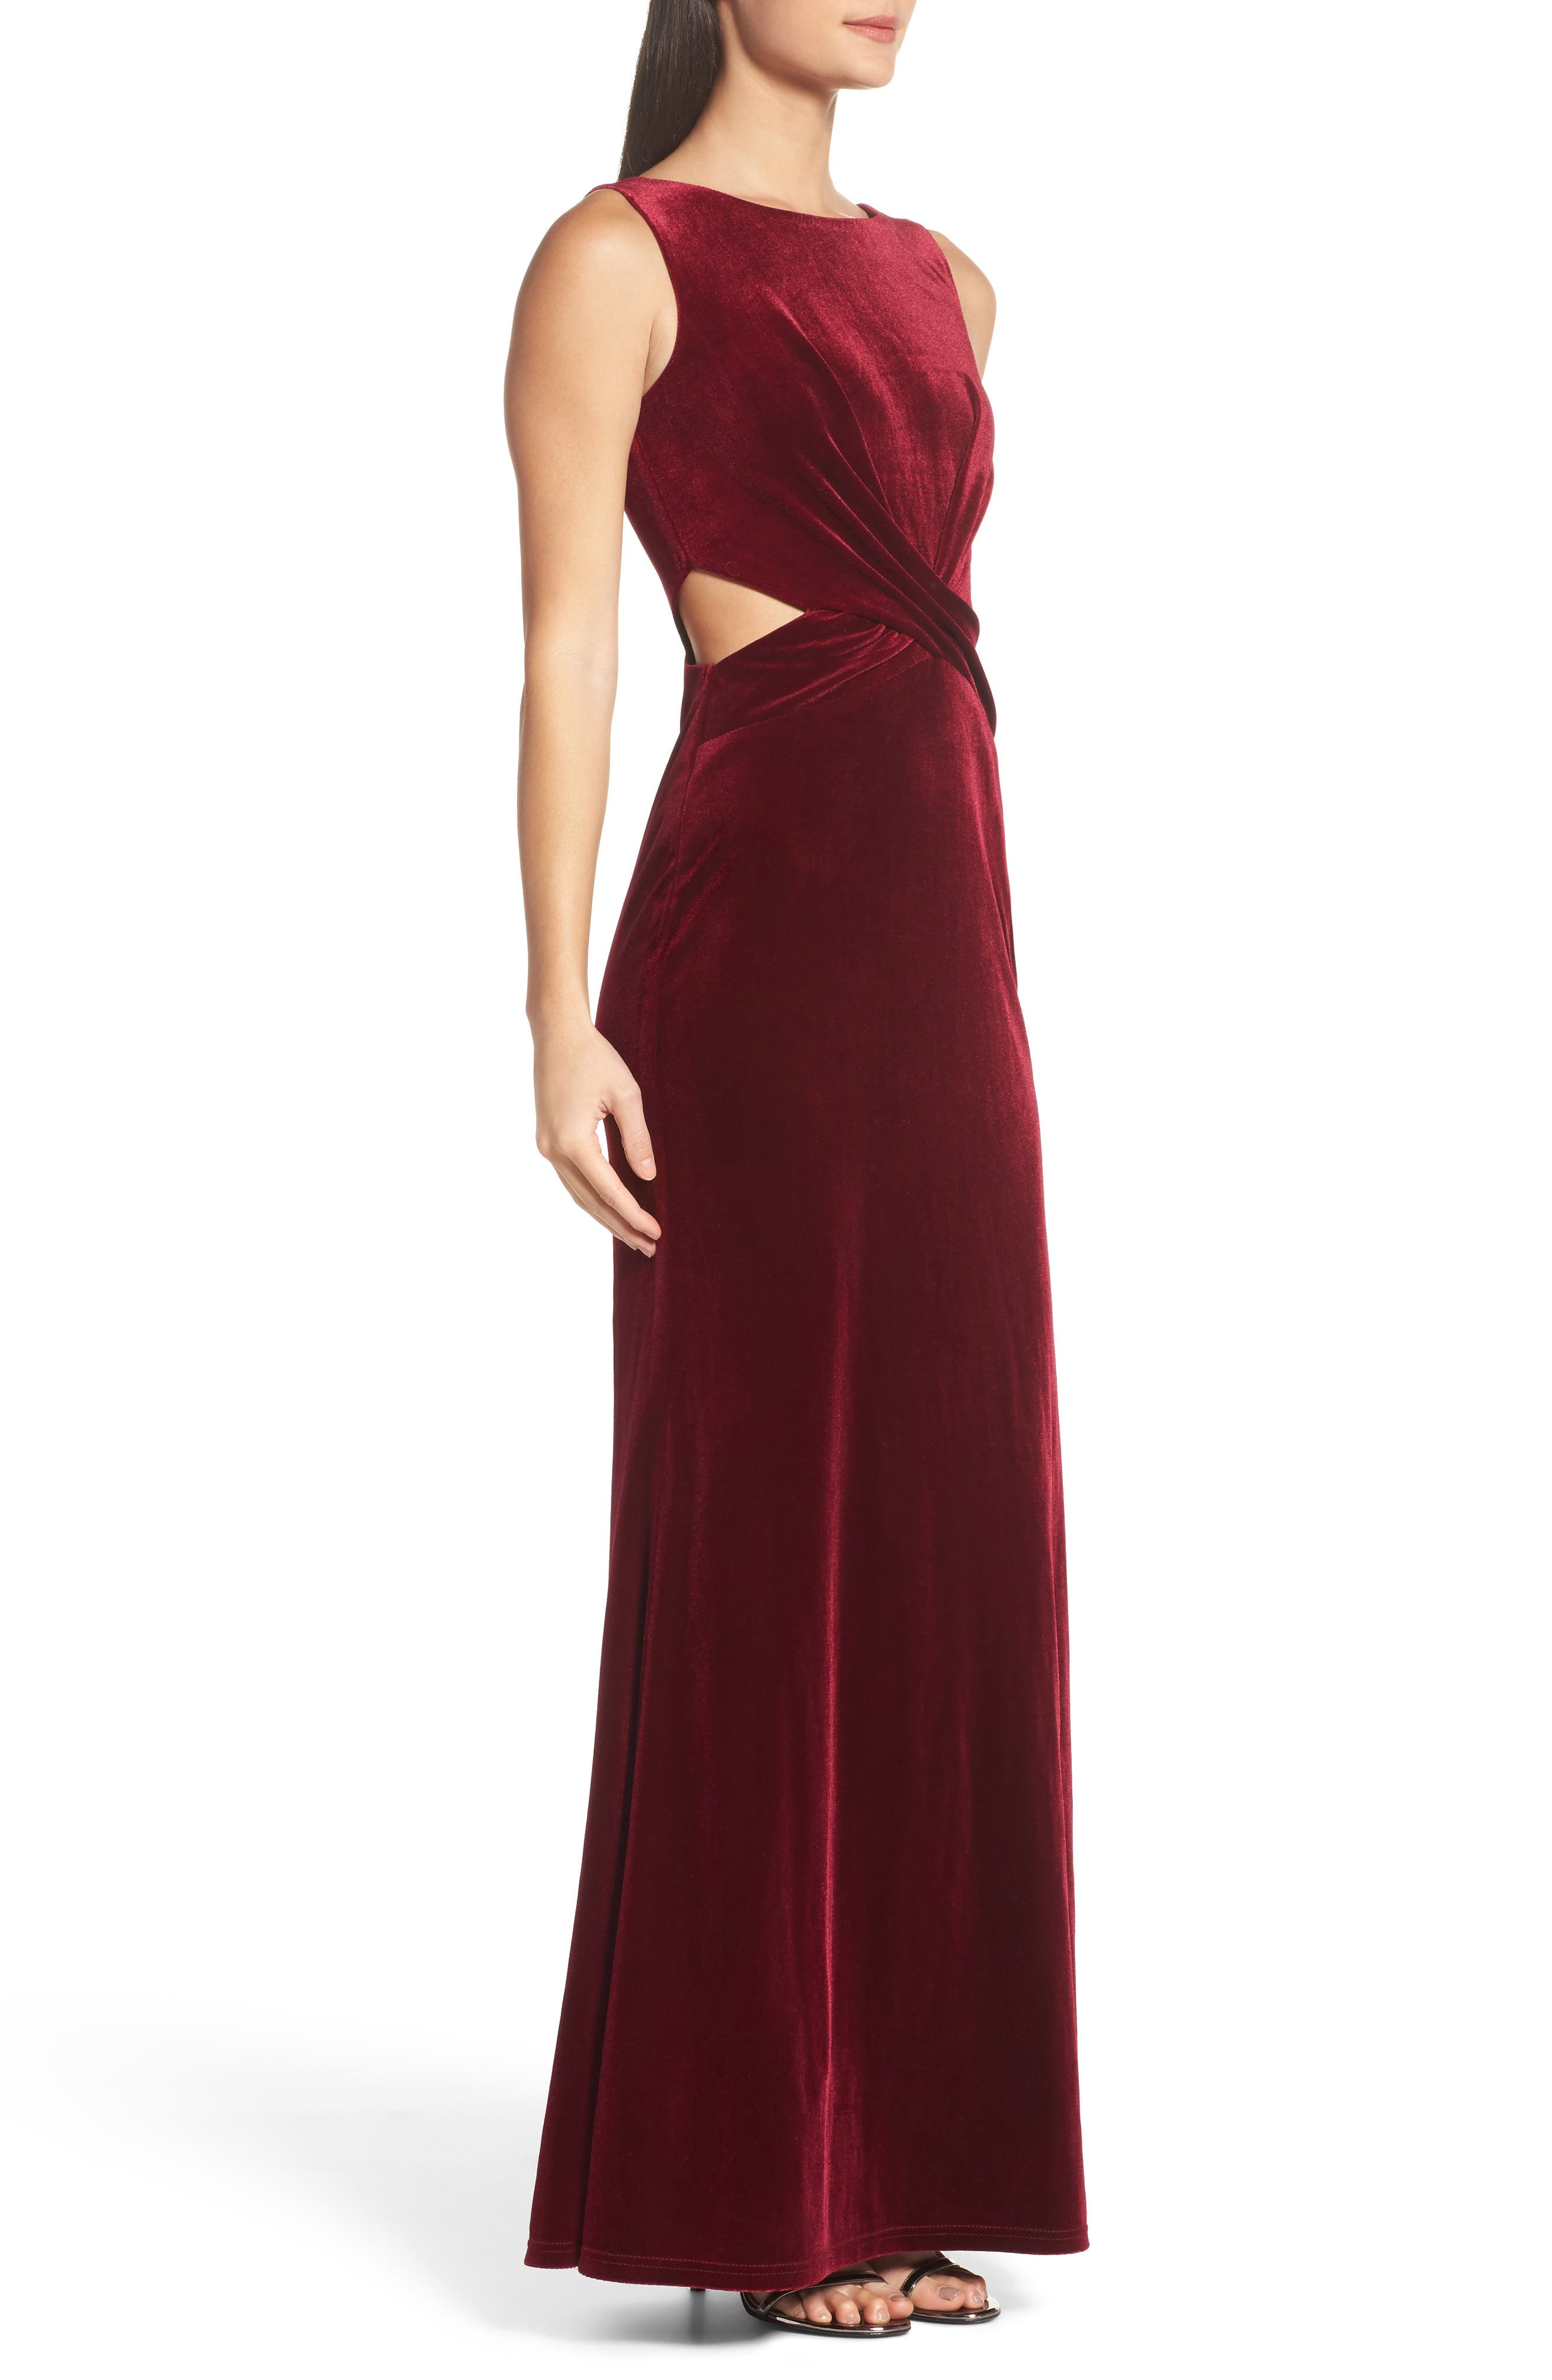 Reach Out Velvet Maxi Dress,                             Alternate thumbnail 3, color,                             Burgundy